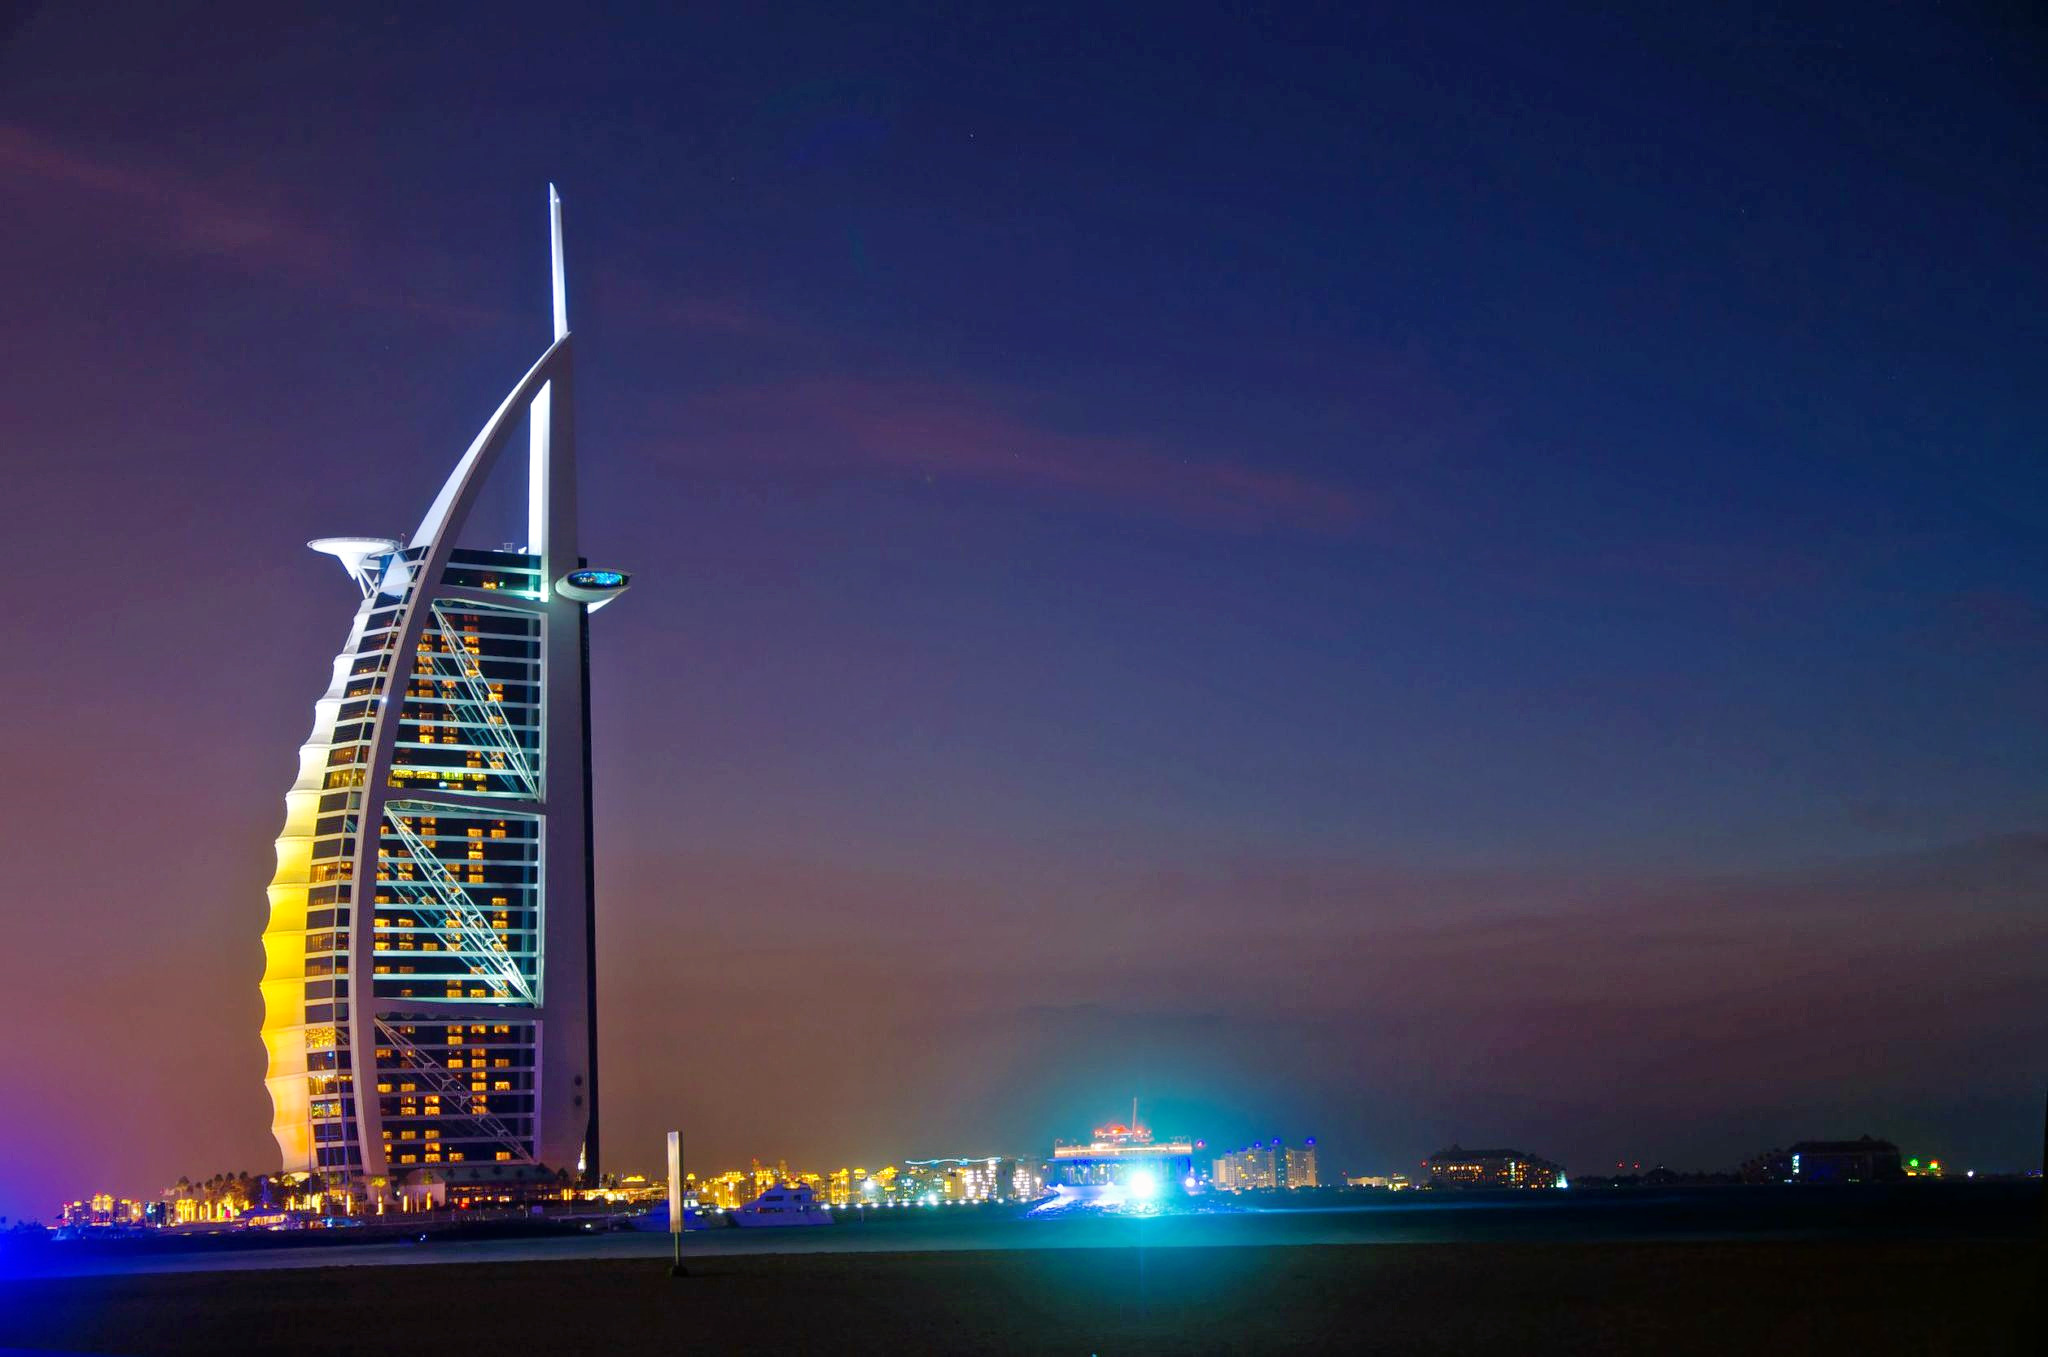 1511331437_burj-al-arab-hotel-in-dubai-united-arab-emirates.jpg